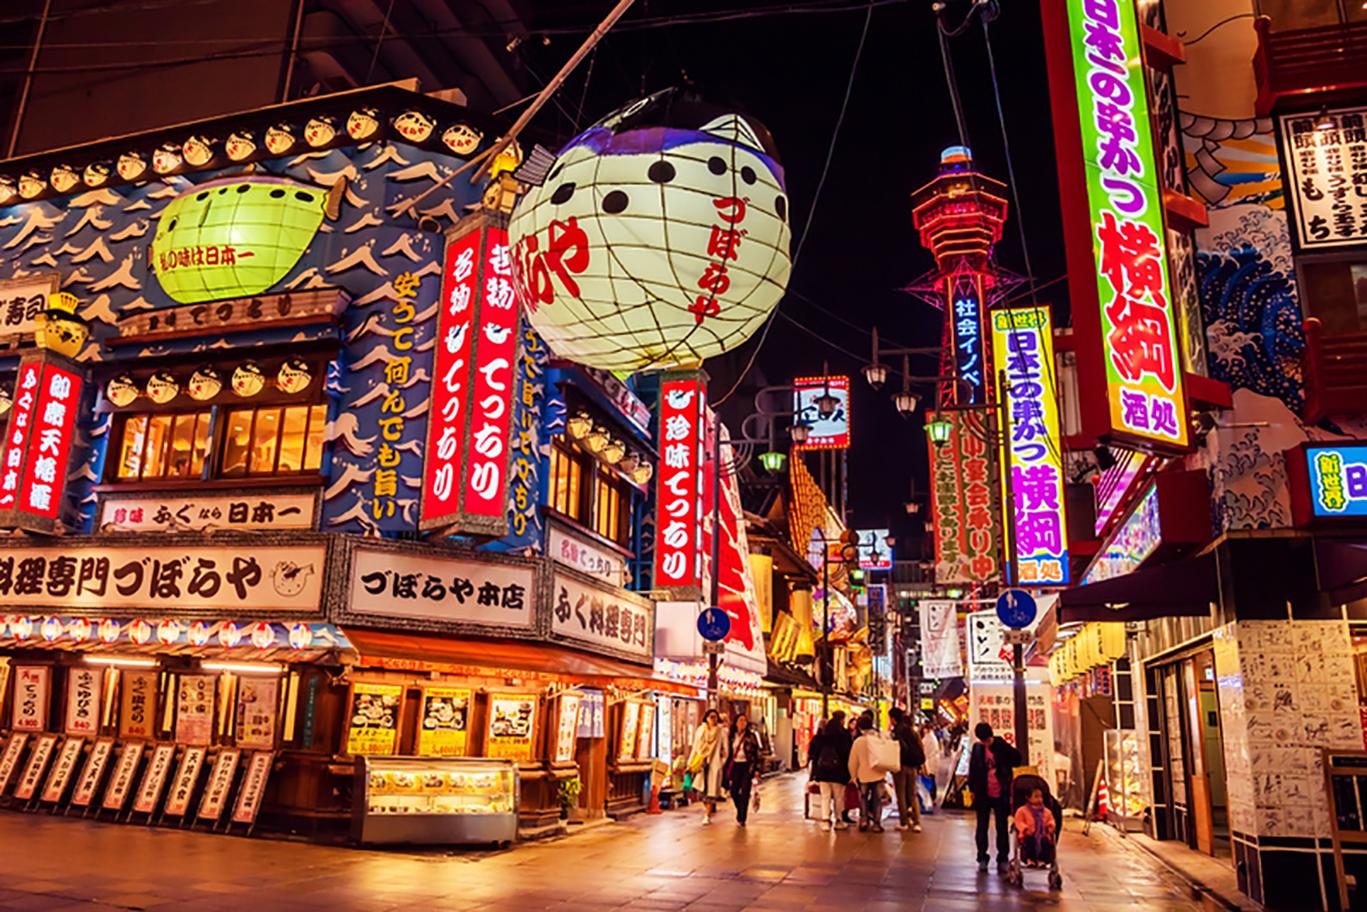 Осака: огни большого города